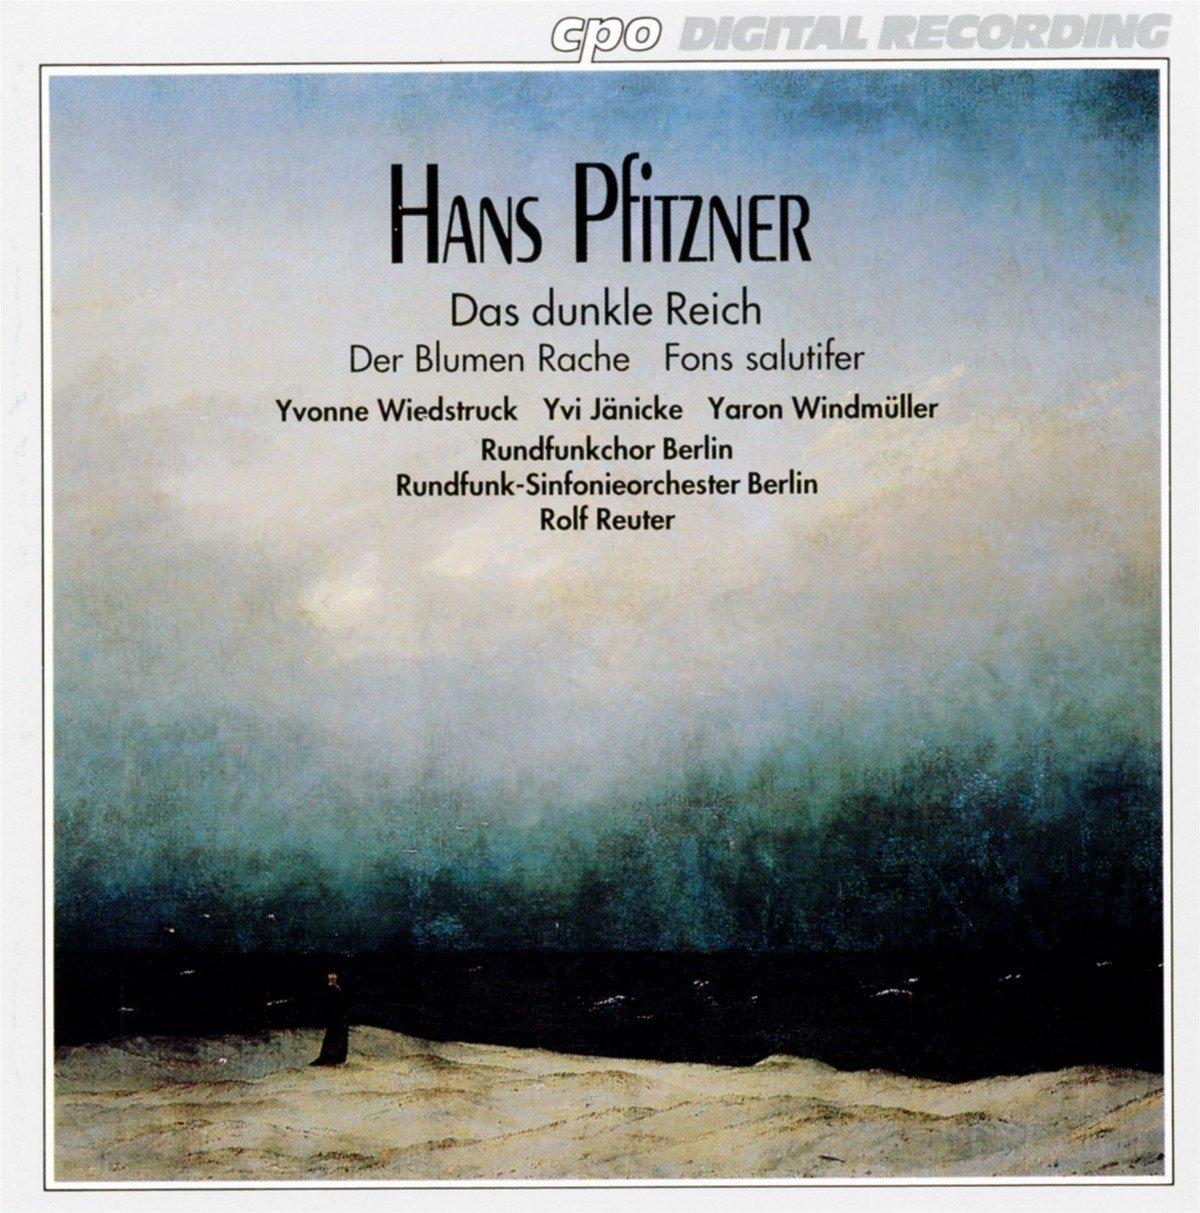 Pfitzner - Wiedstruck, Janicke, Windmuller, Rold Reuter Das dunkle Reich Vinyl